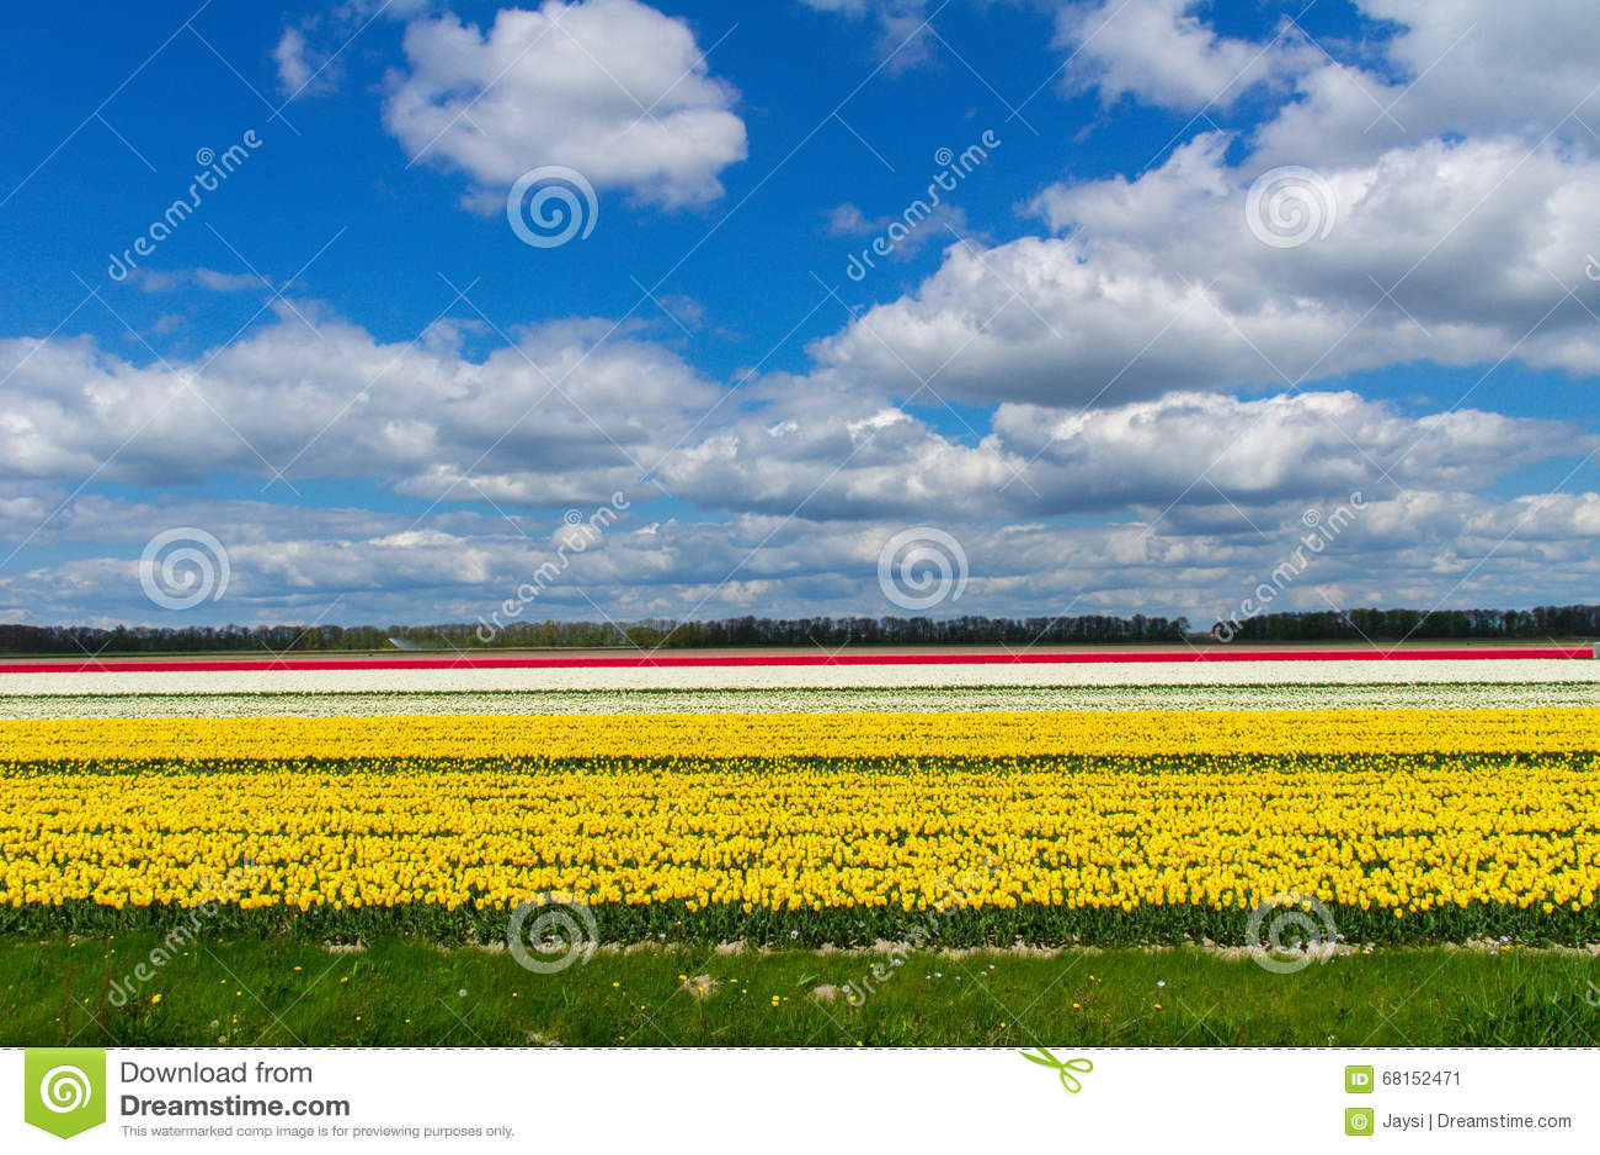 Frhlingstulpenfelder In Holland Blumen In Den Niederlanden Stockbild  Bild von kultur